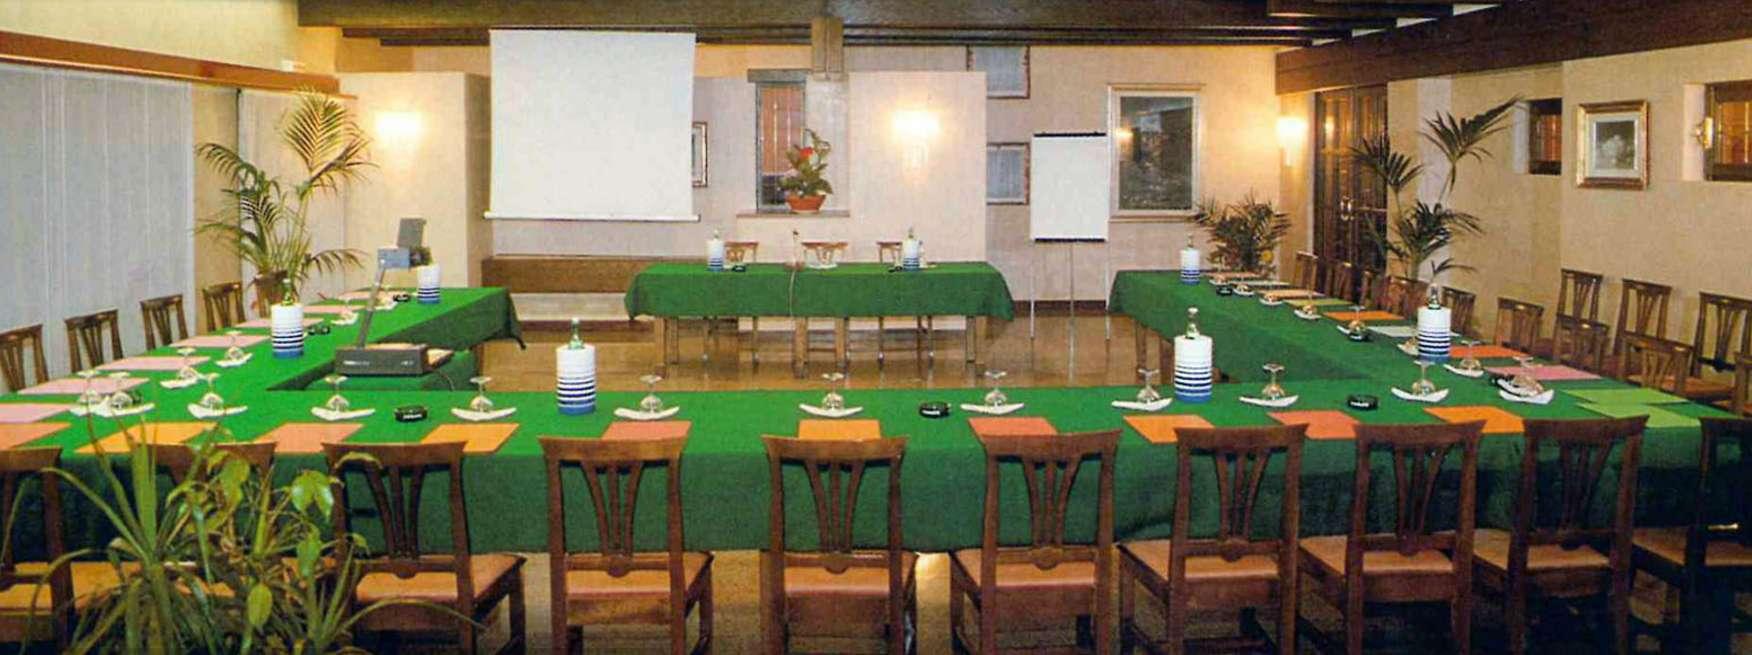 Immagine sala riunioni